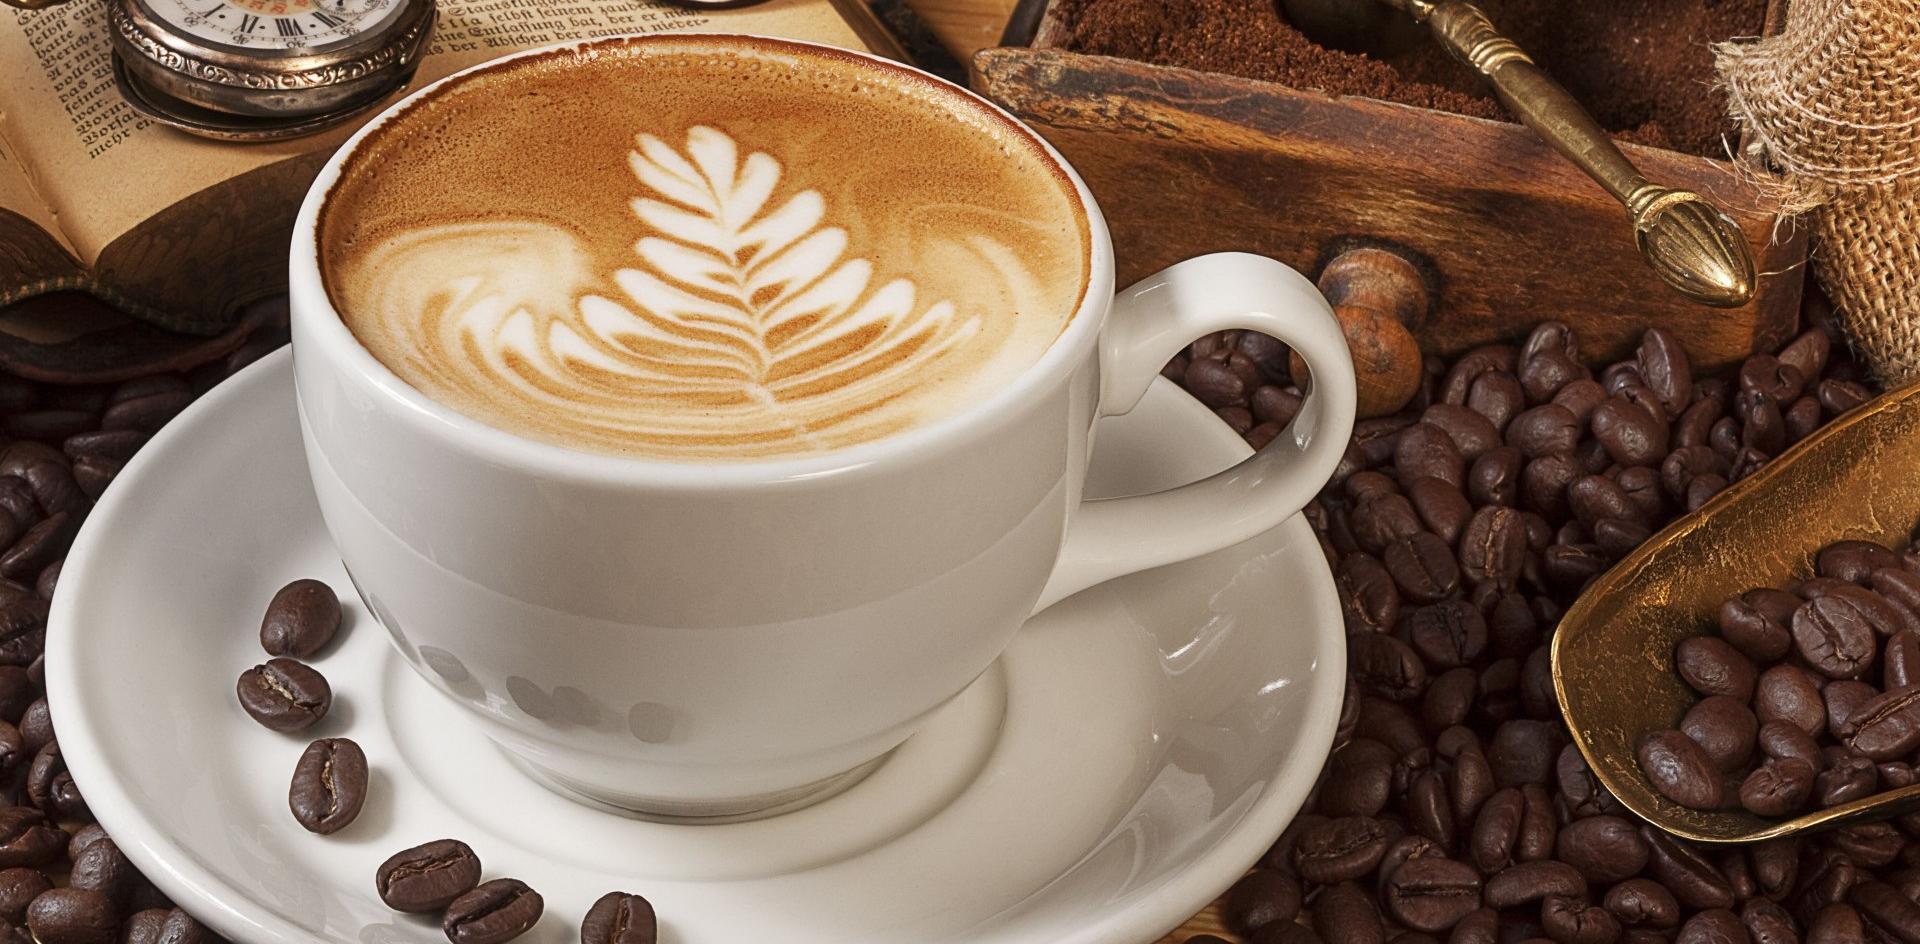 cach-pha-cafe-latte